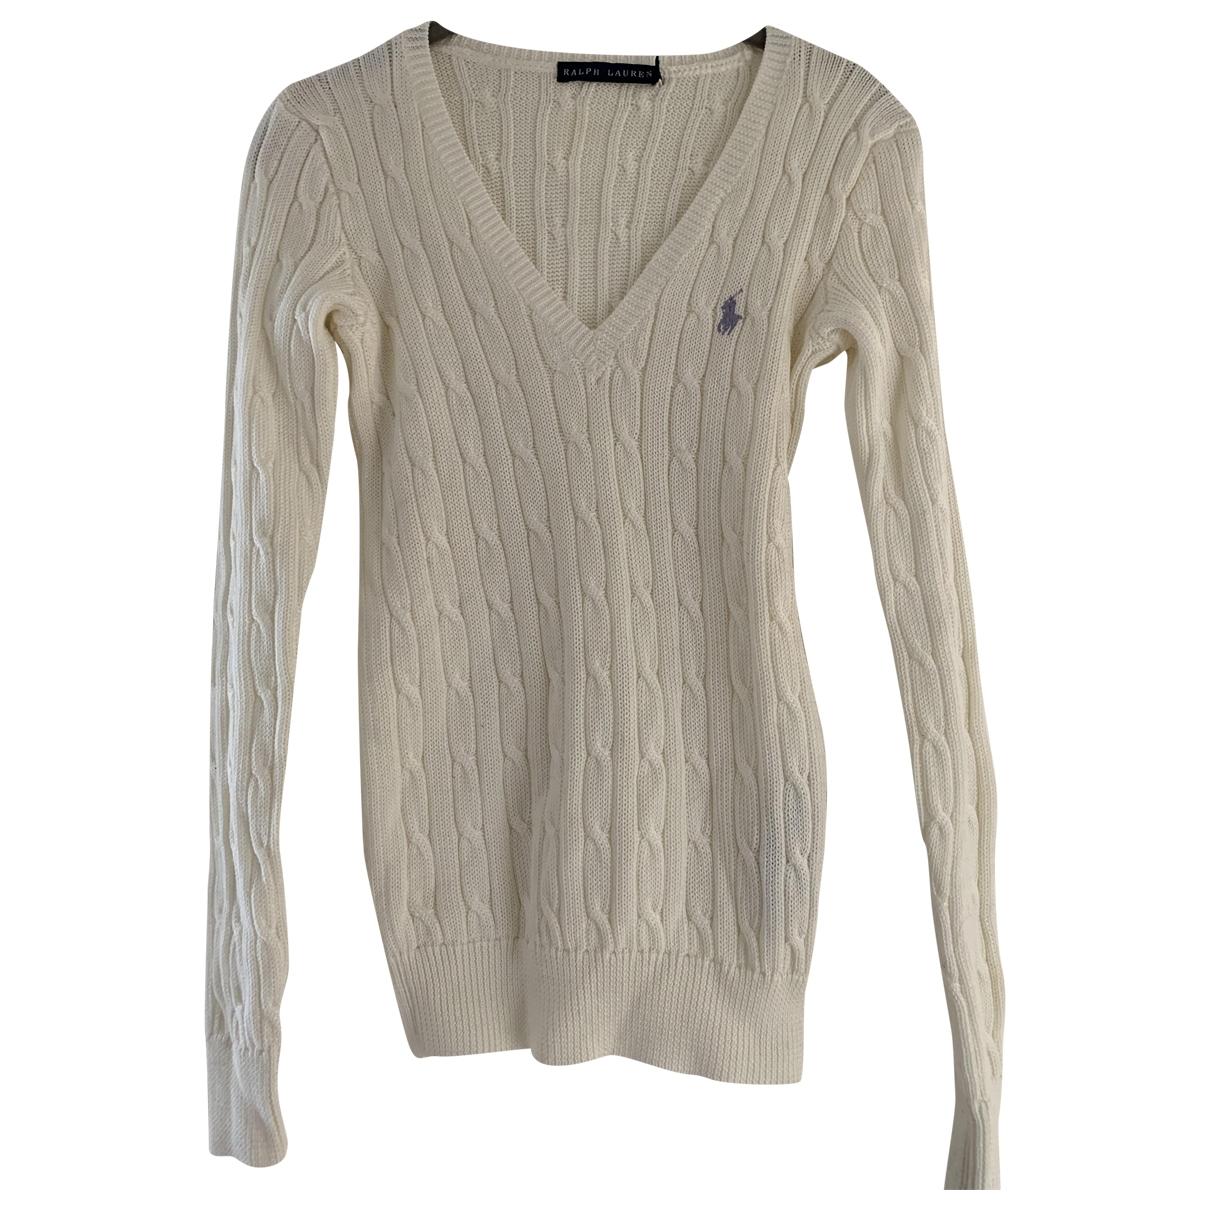 Ralph Lauren \N Ecru Cotton Knitwear for Women S International